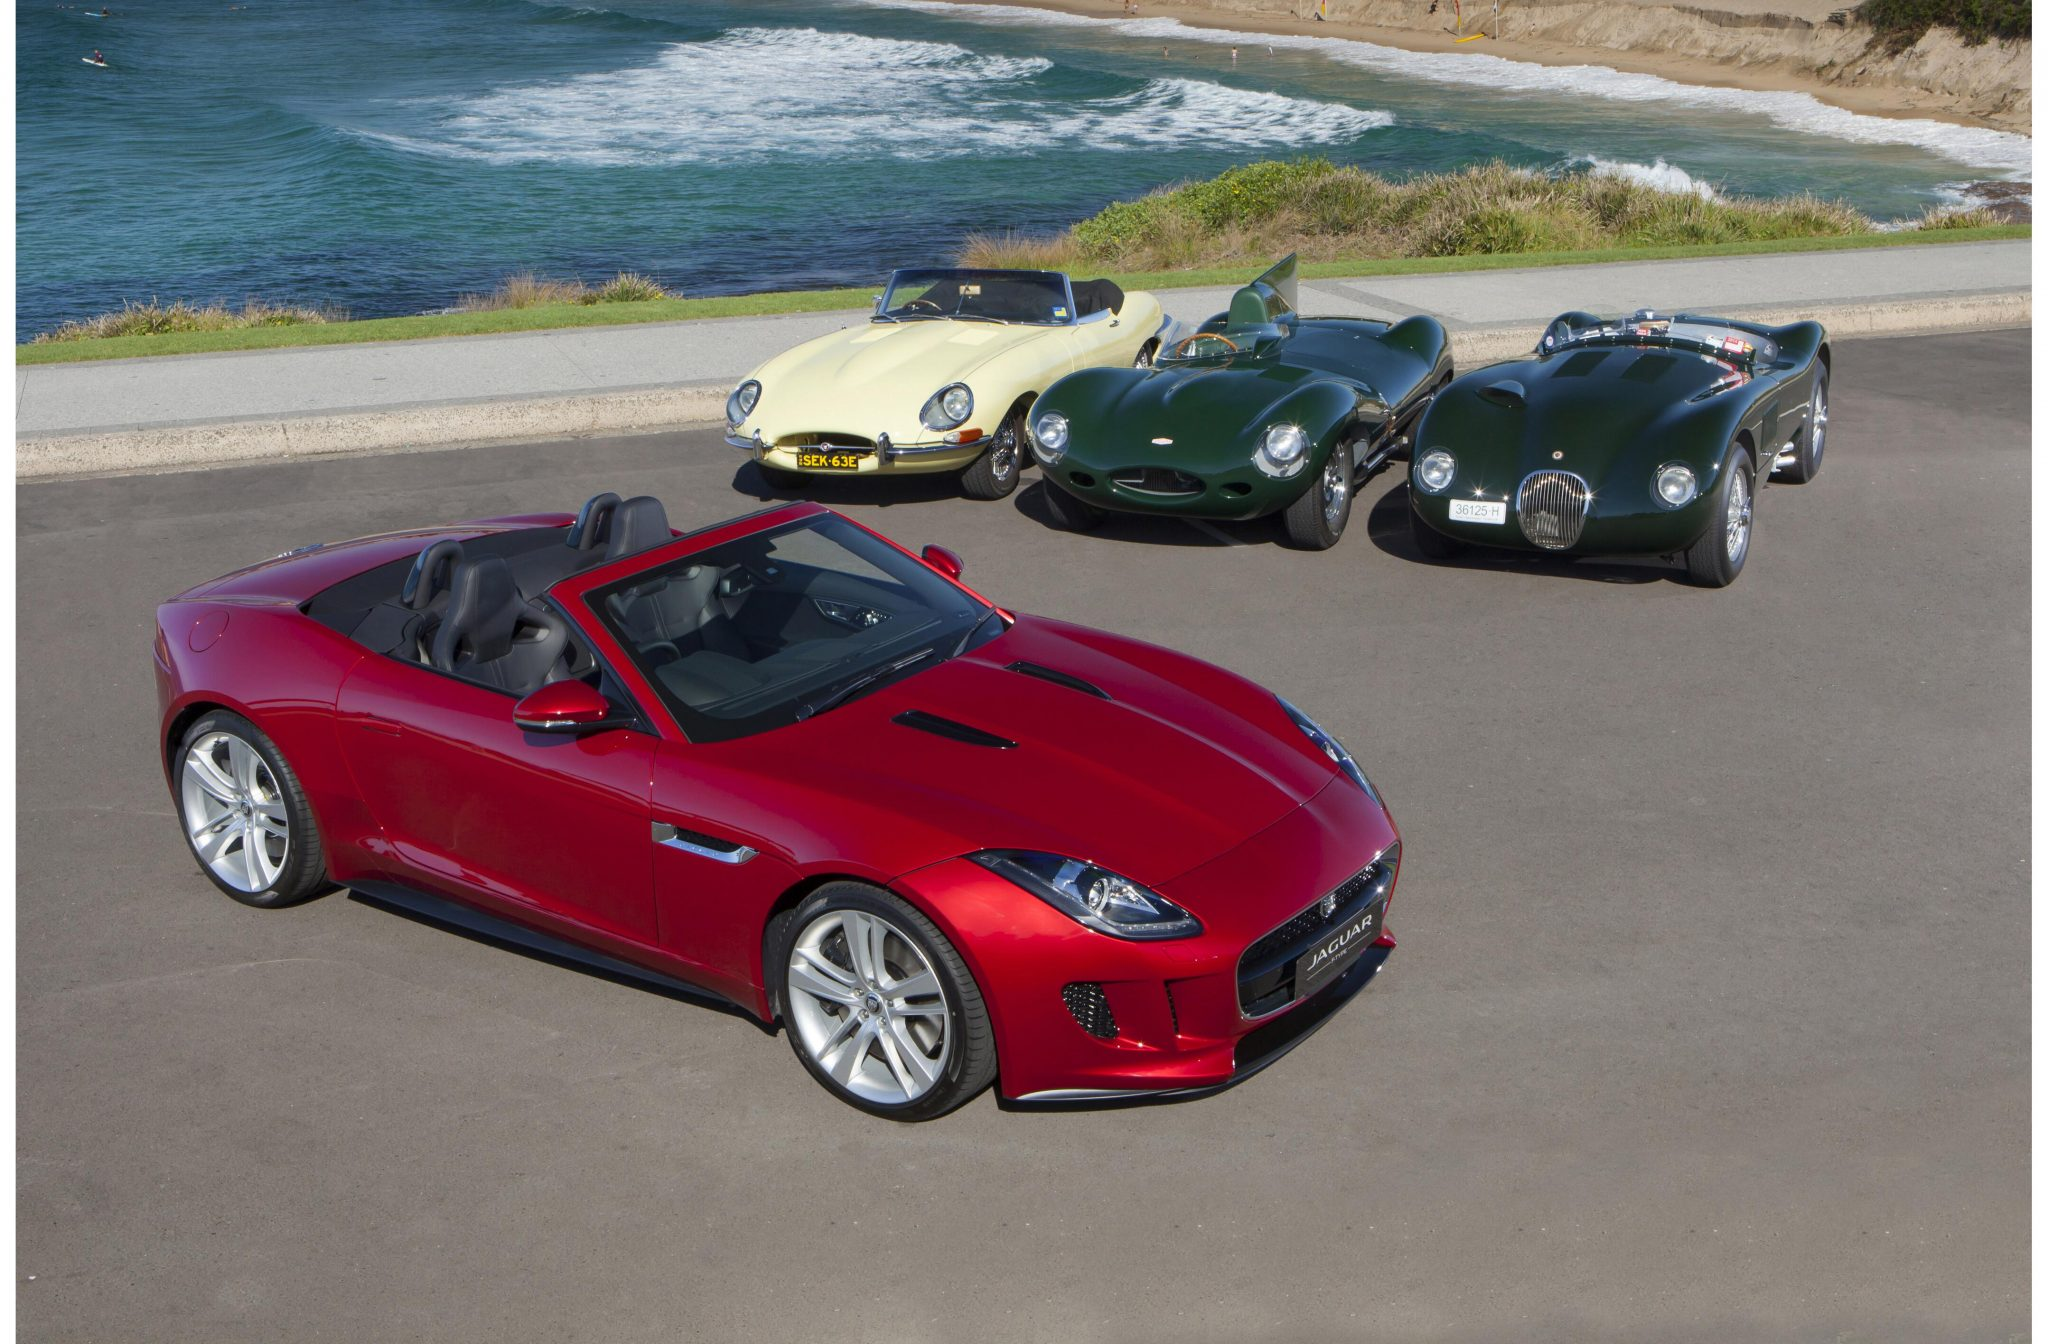 jaguar f type price specs announced from 139 000. Black Bedroom Furniture Sets. Home Design Ideas